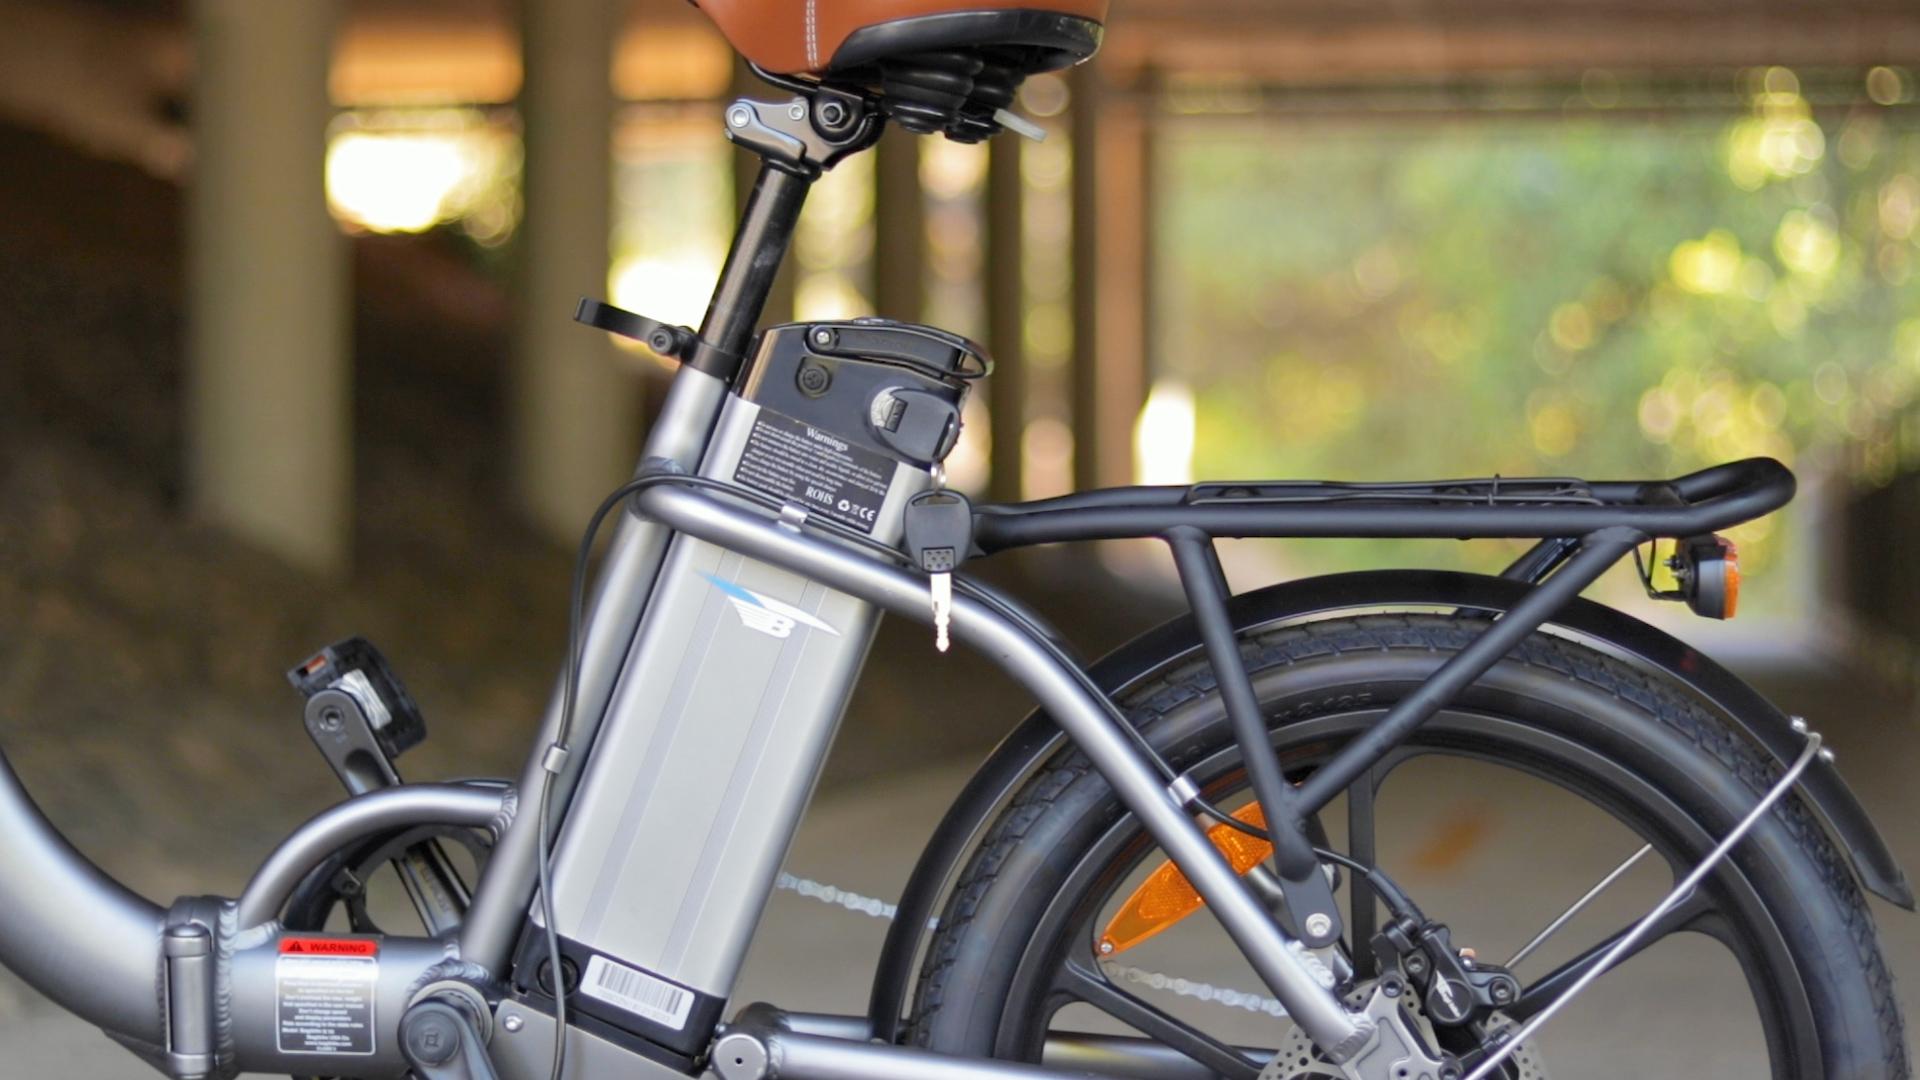 electrified-reviews-bagibike-b10-foldign-electric-bike-review-battery.jpg